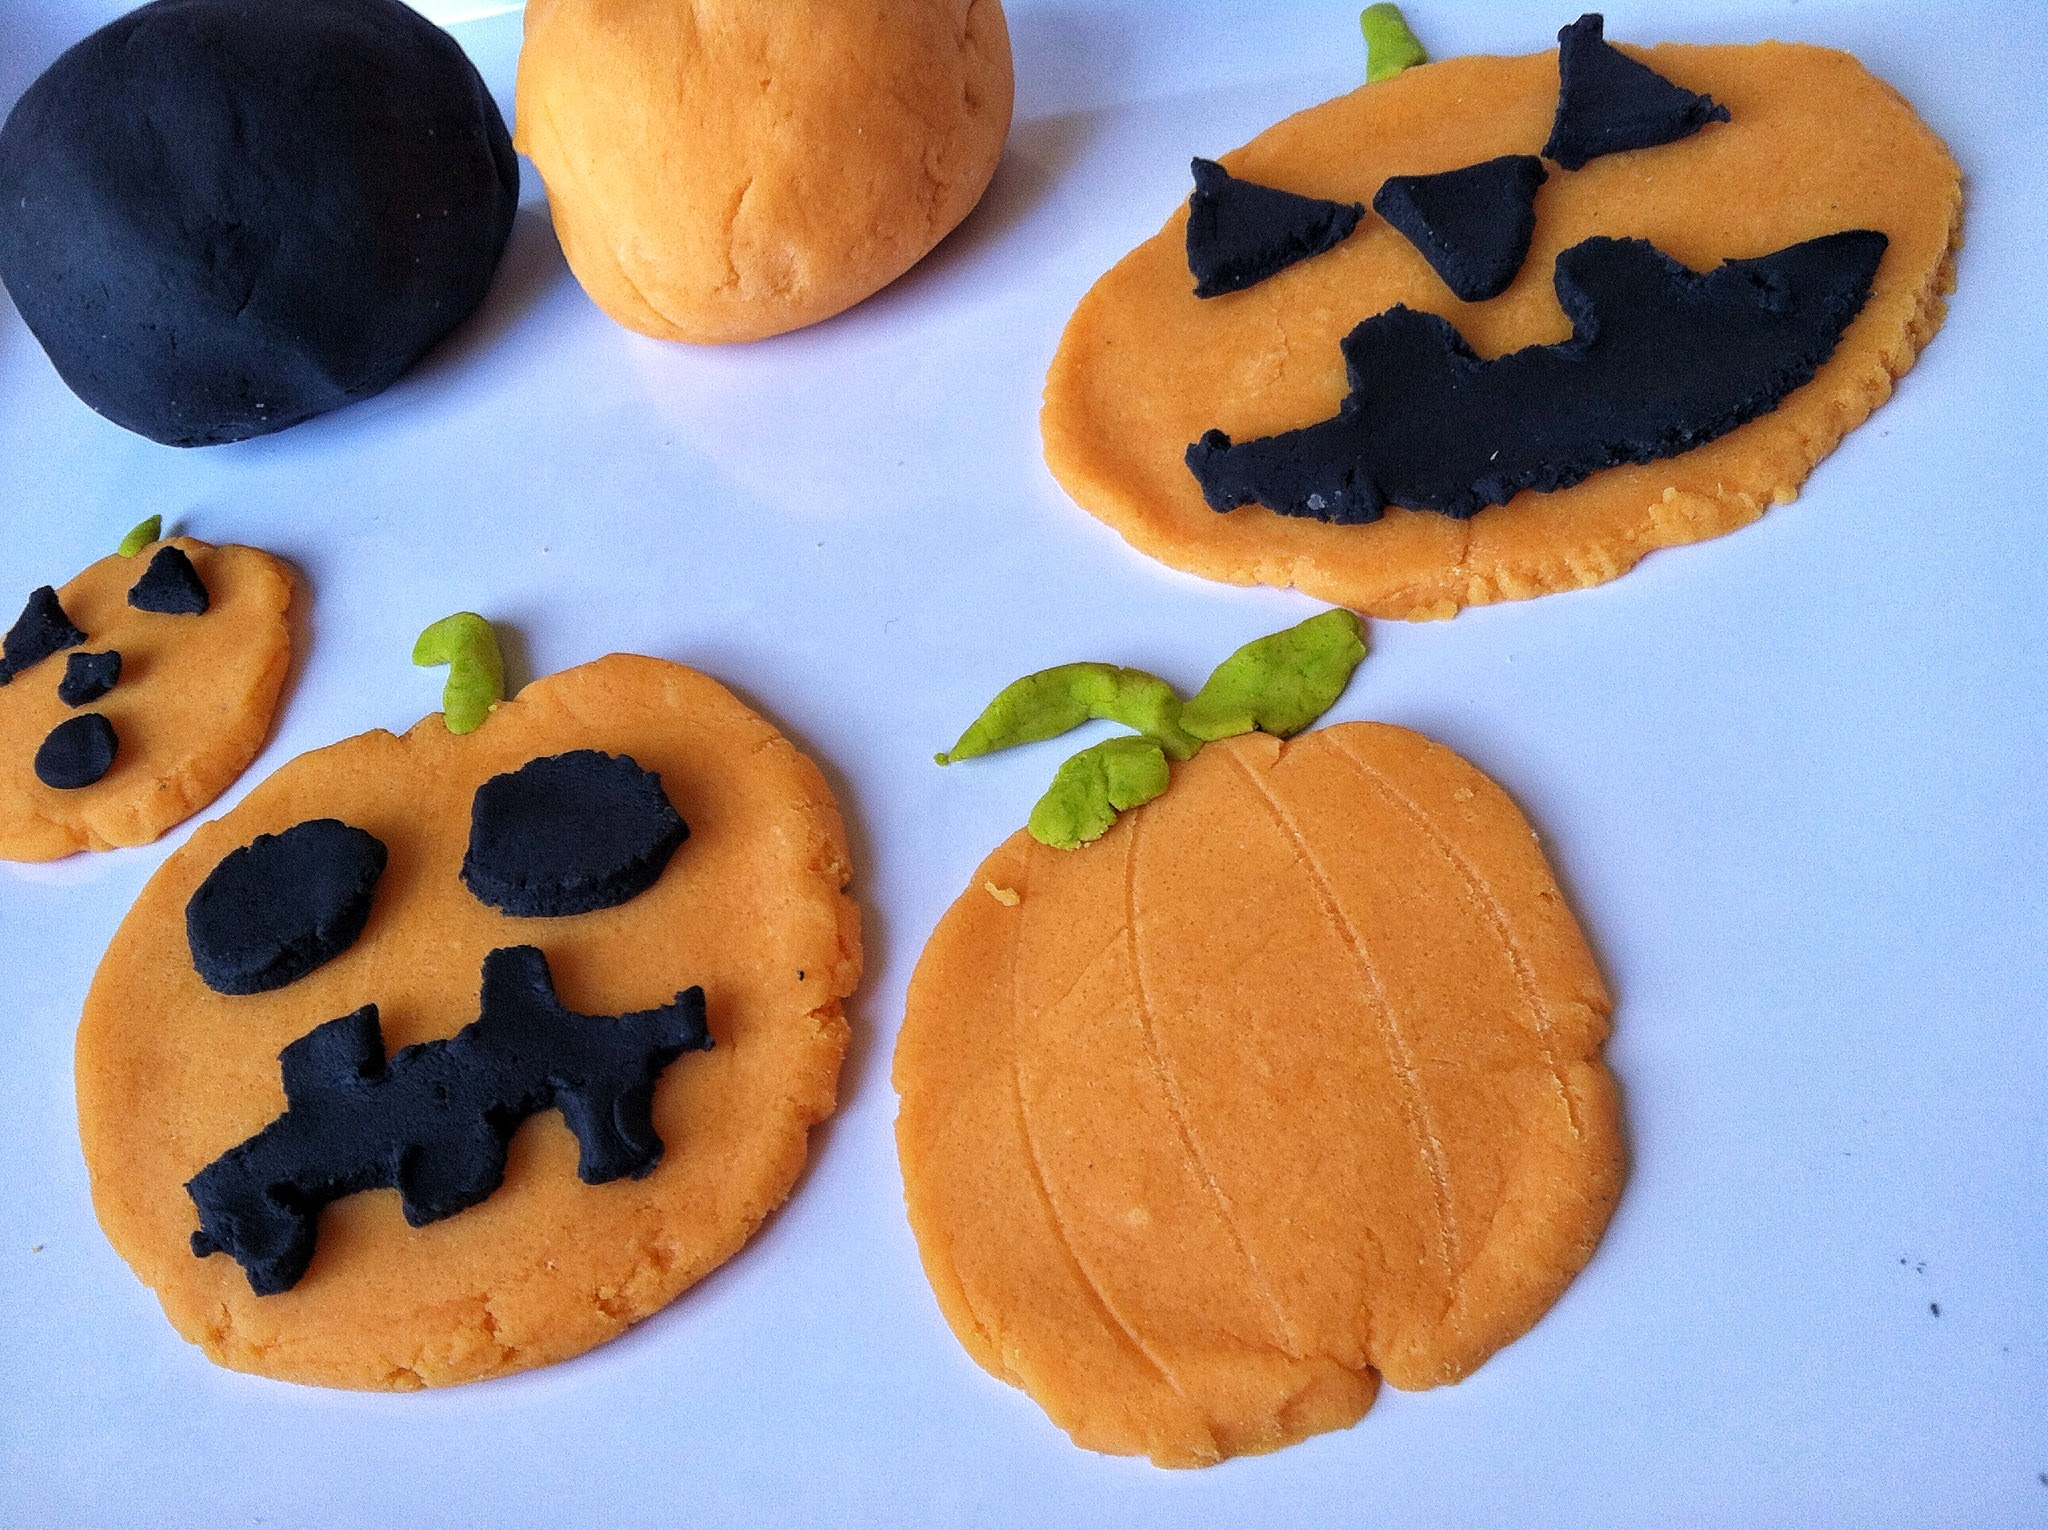 halloween craft and invitation to play: halloween play dough